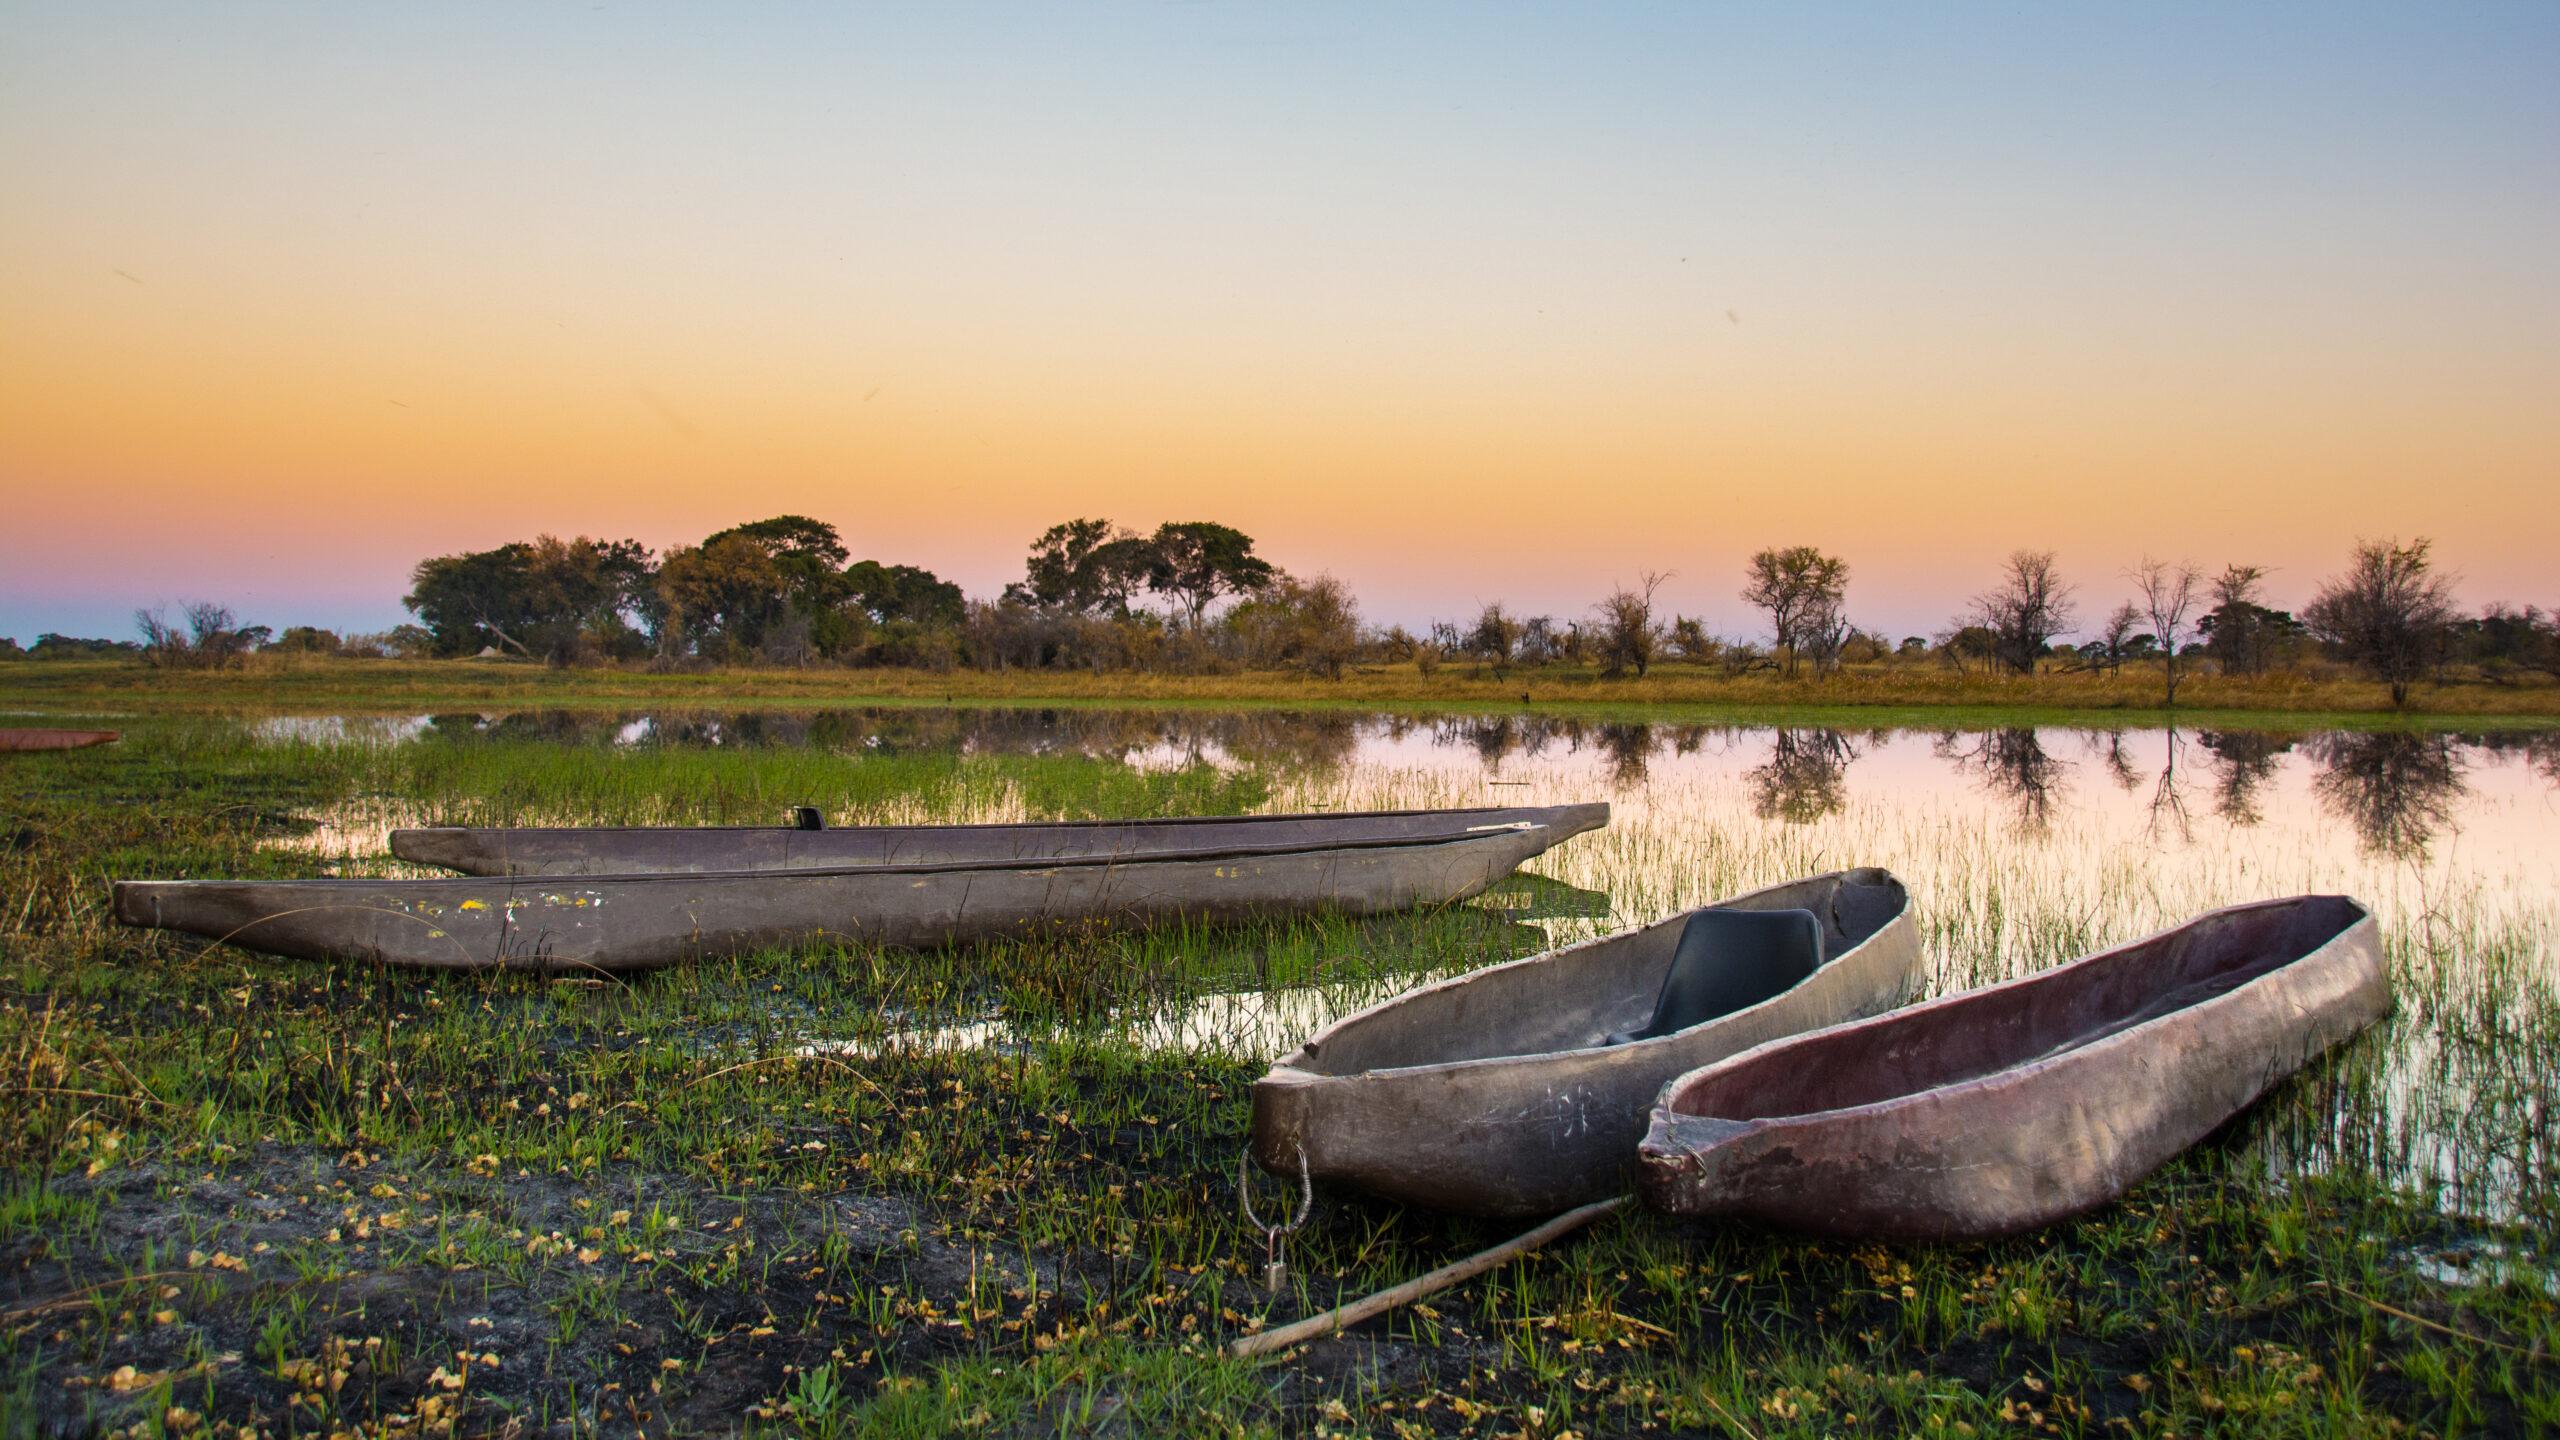 Mocorros of the Okavango Delta